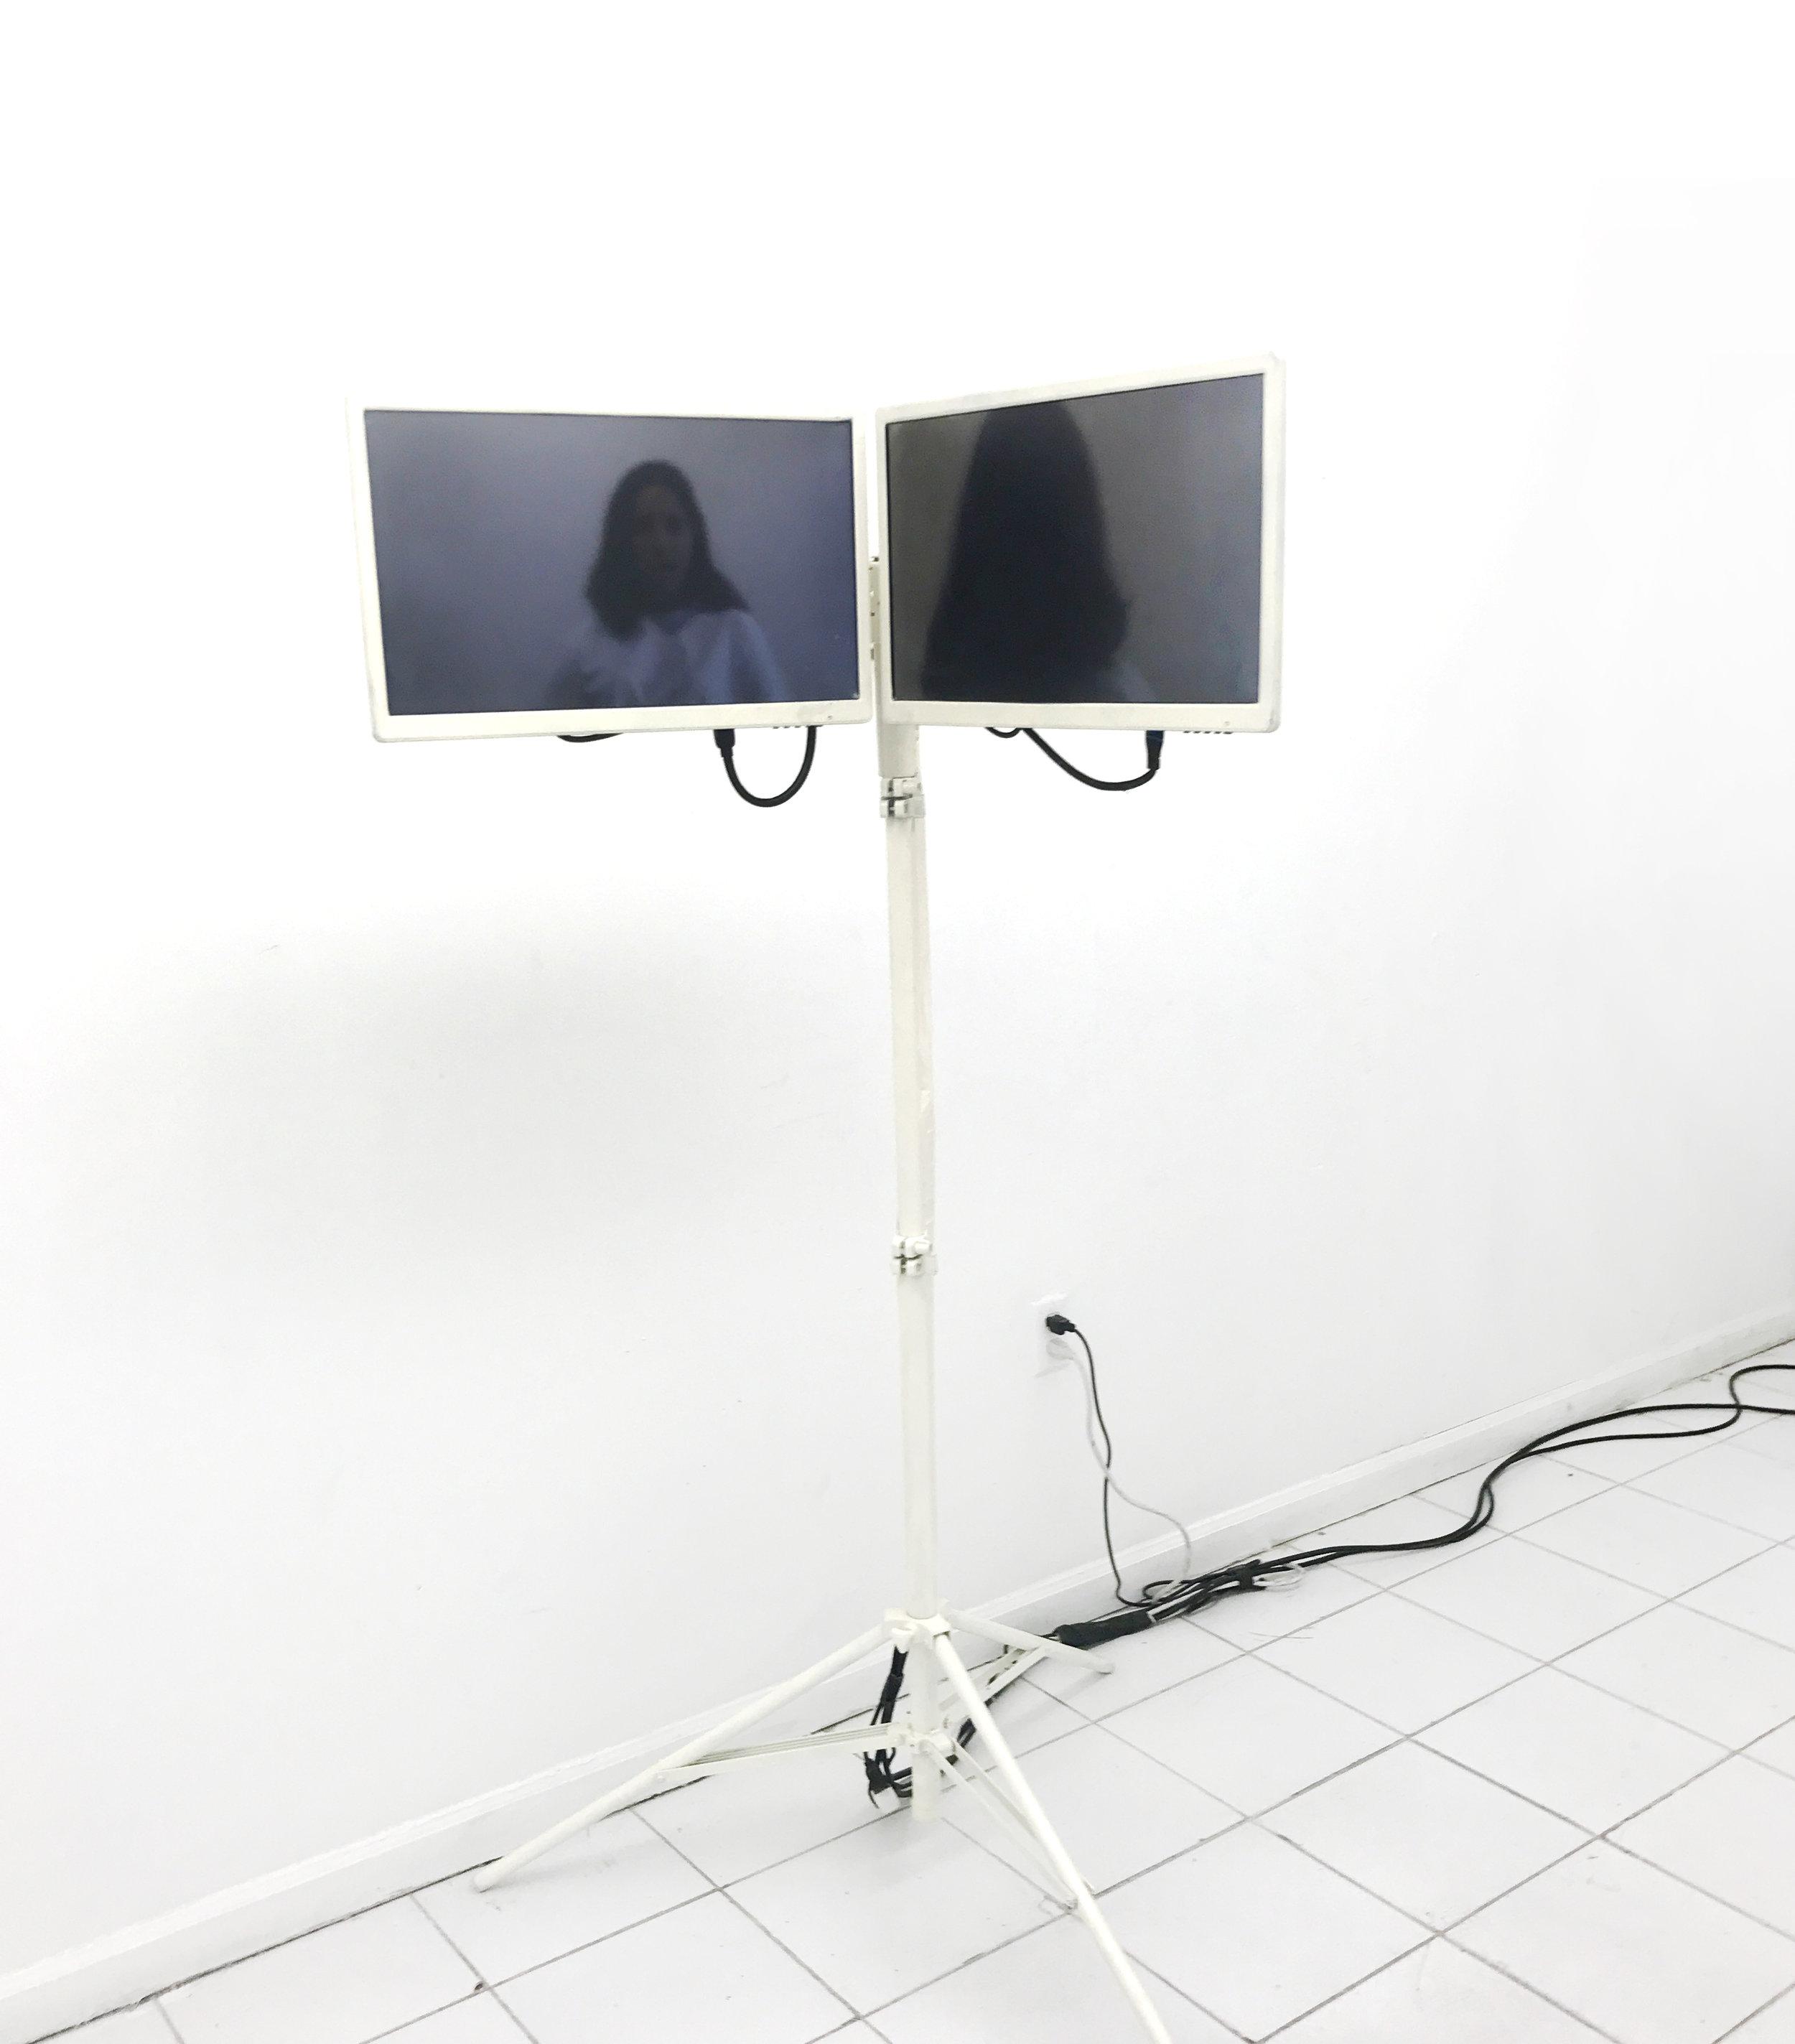 Sean Donovan, Richard Vivenzio  Hello Goodbye, 2017  monitors, video loop, tripod 56 x 32 inches (142 x 81 cm)